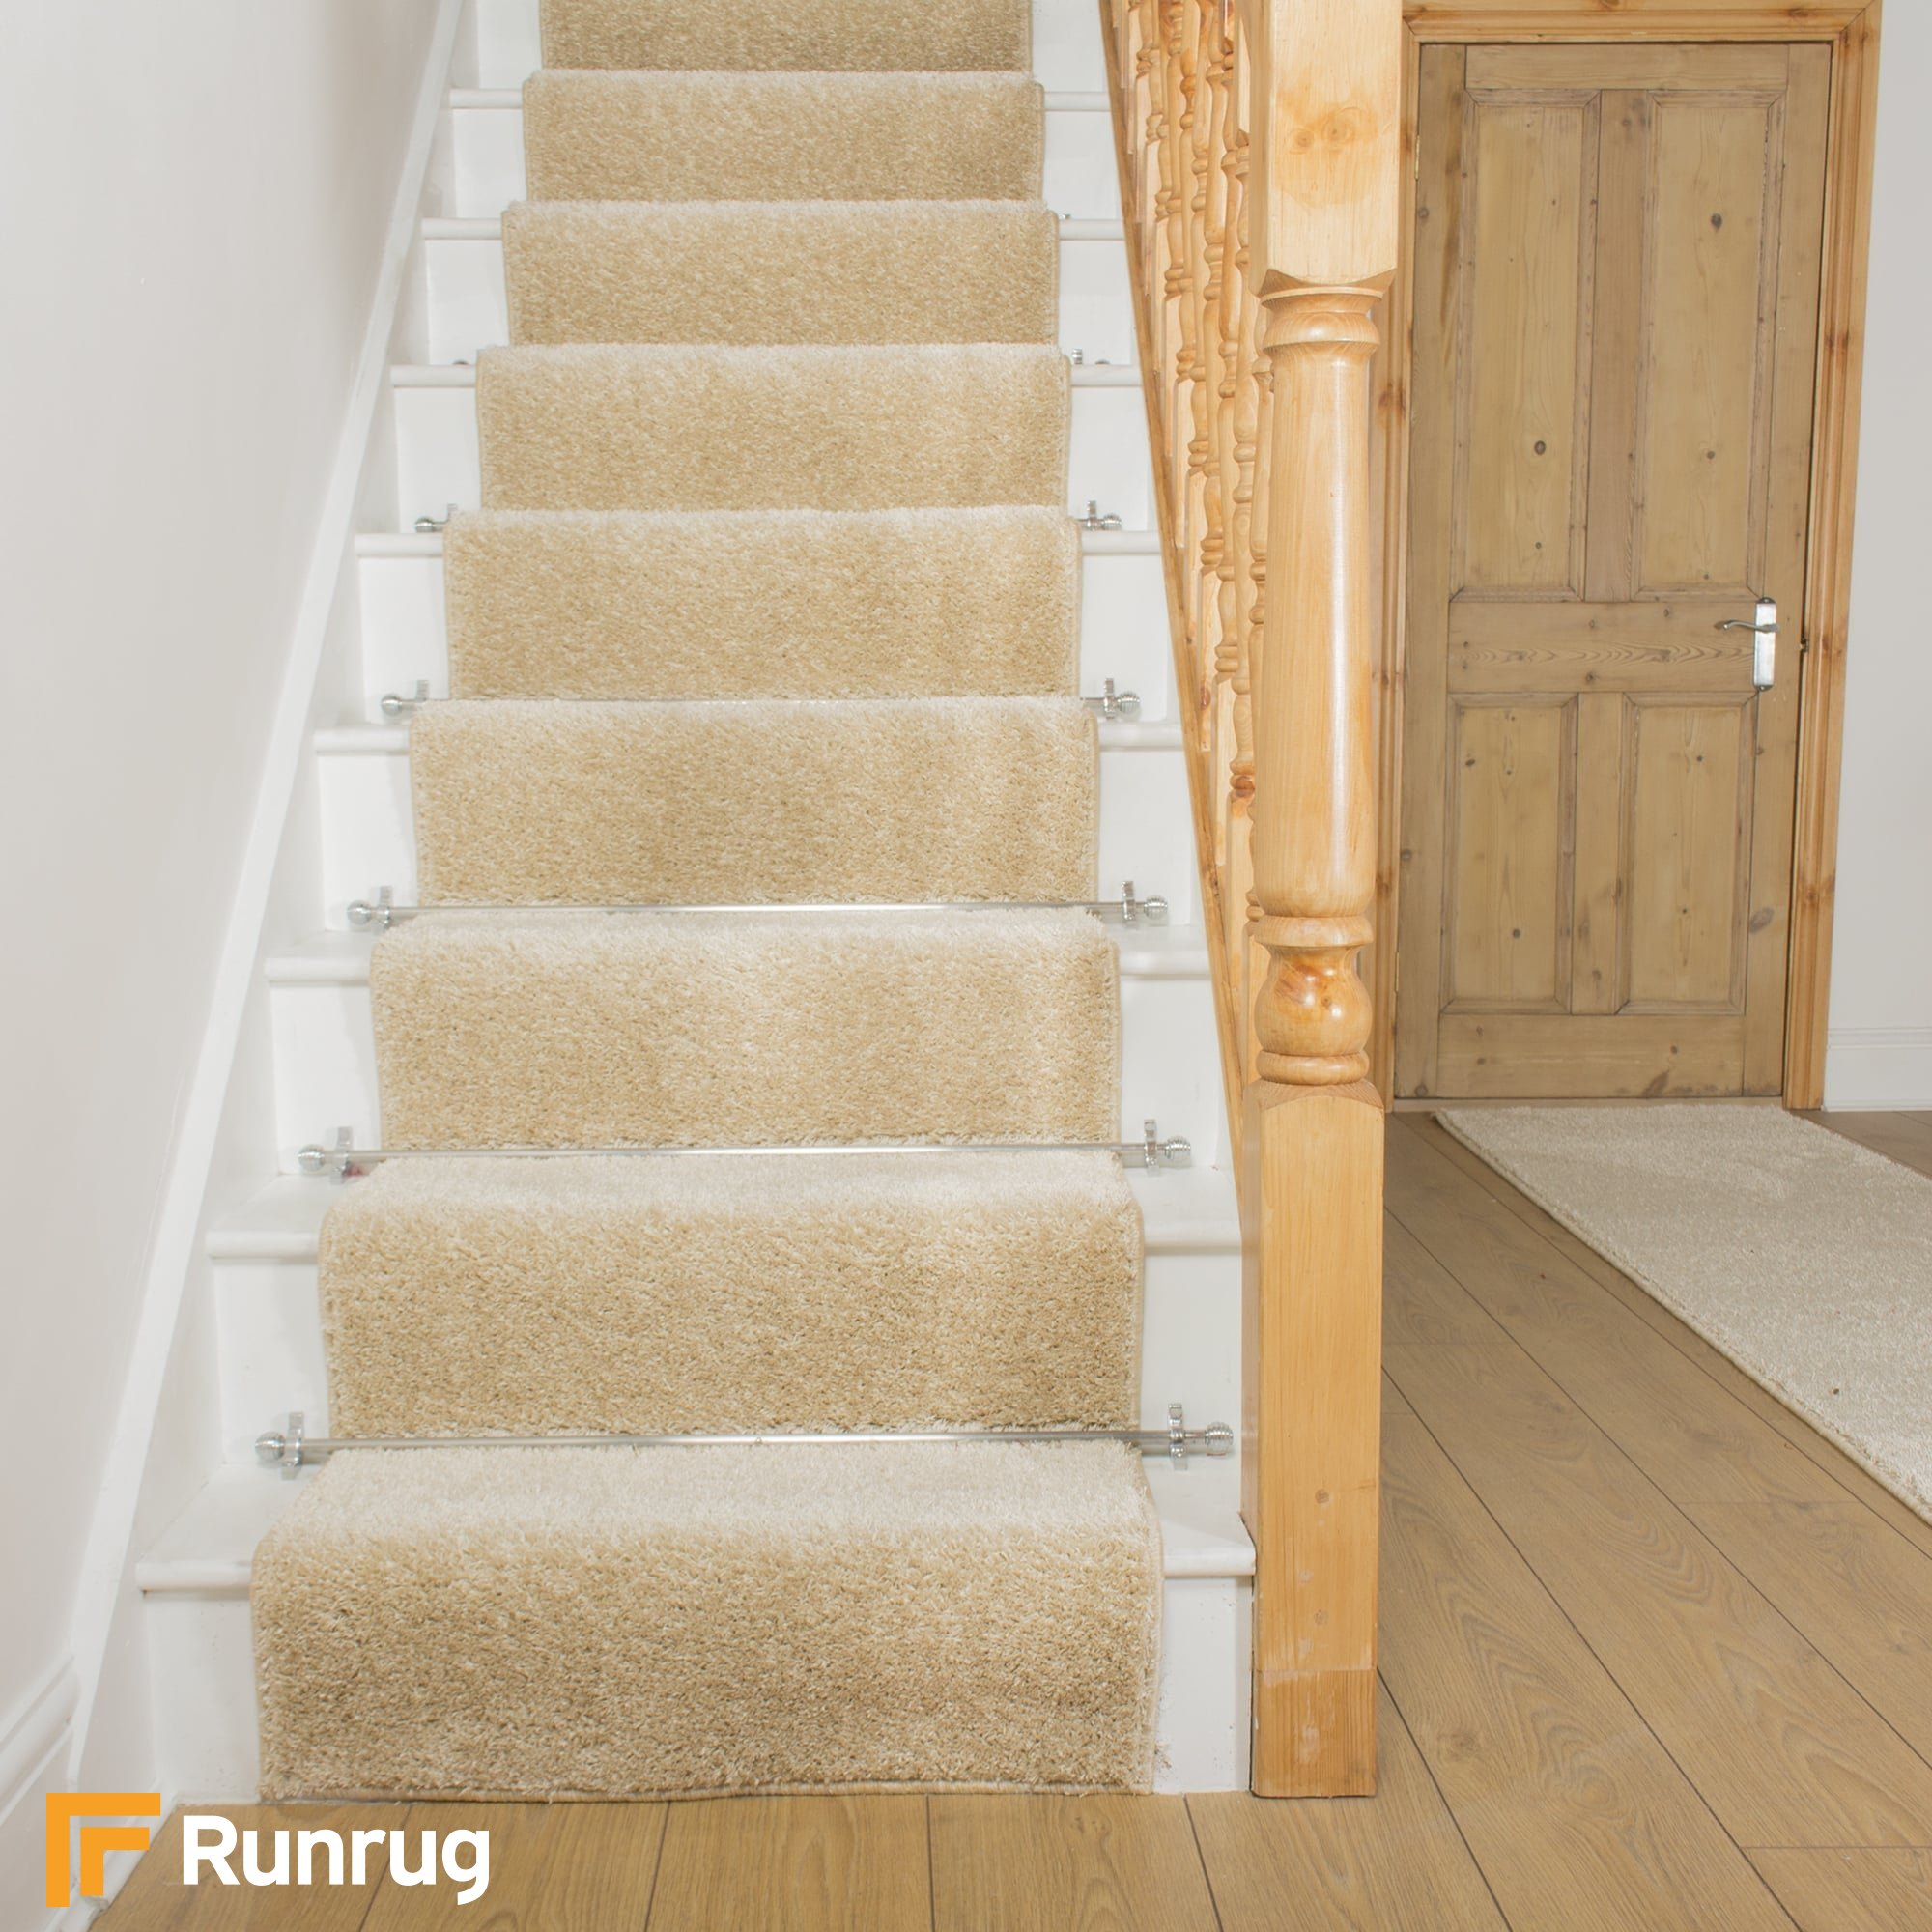 Shaggy Cream Stair Runner